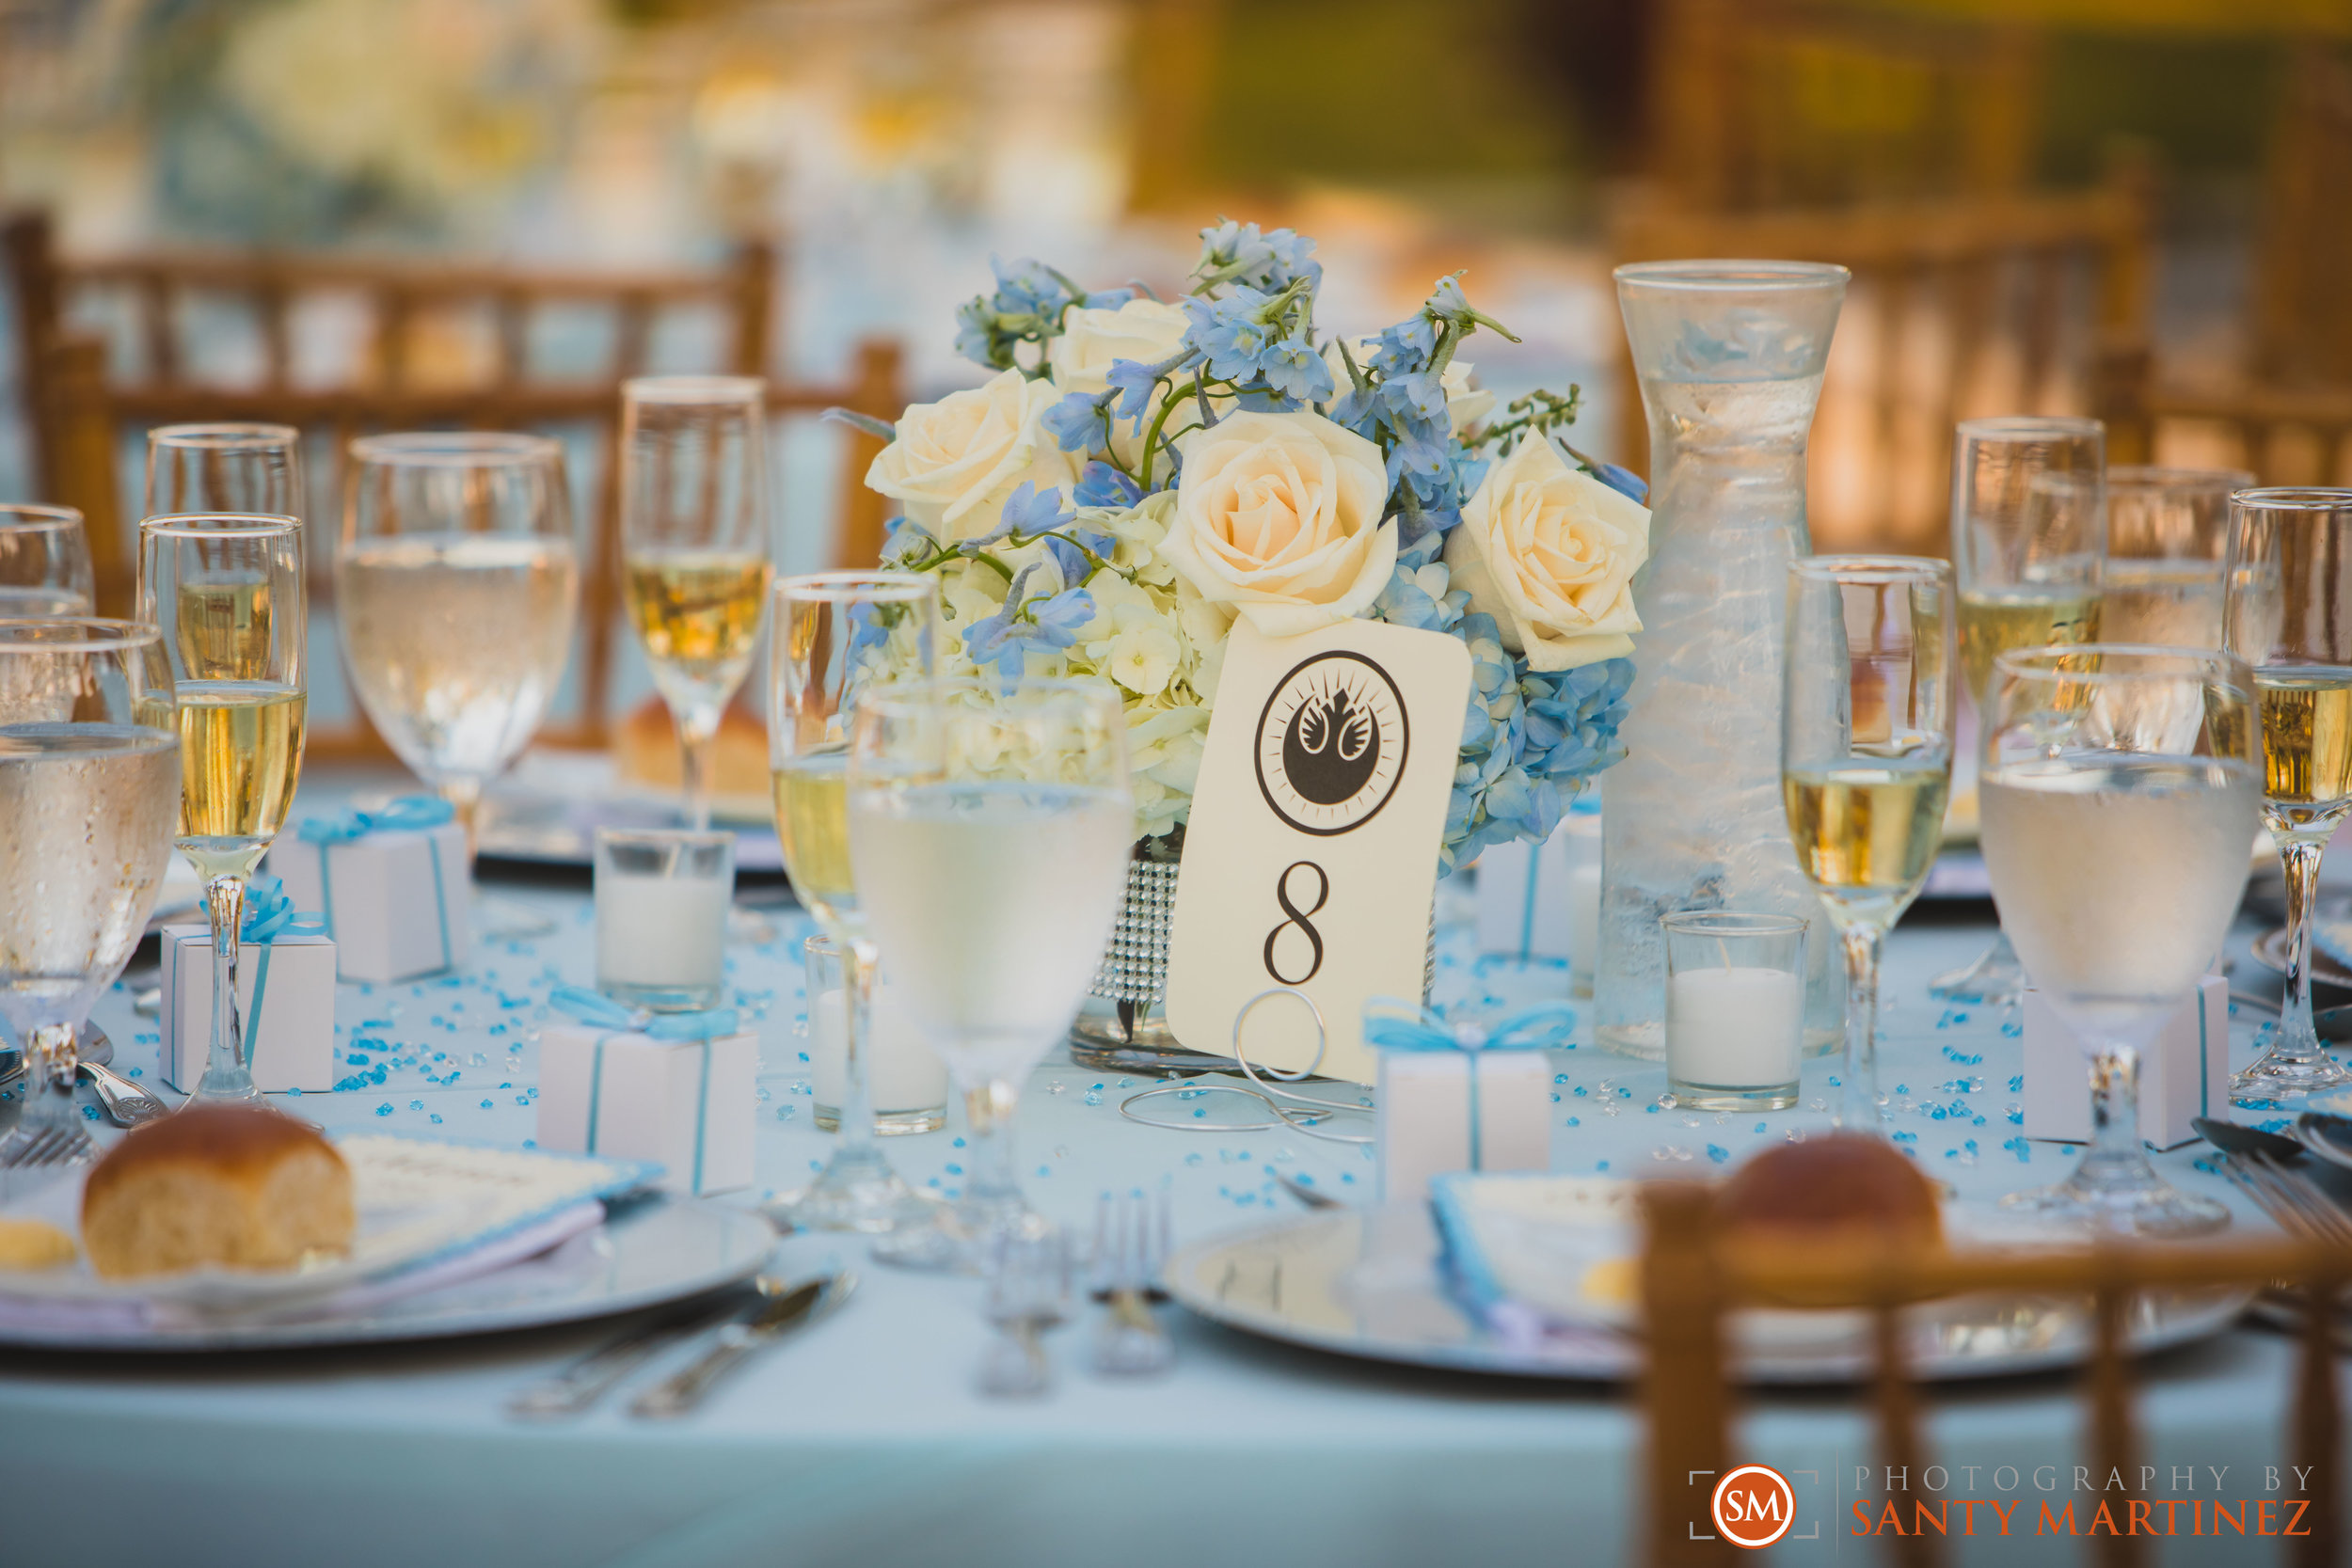 Wedding - Whimsical key West House - Photography by Santy Martinez-34.jpg